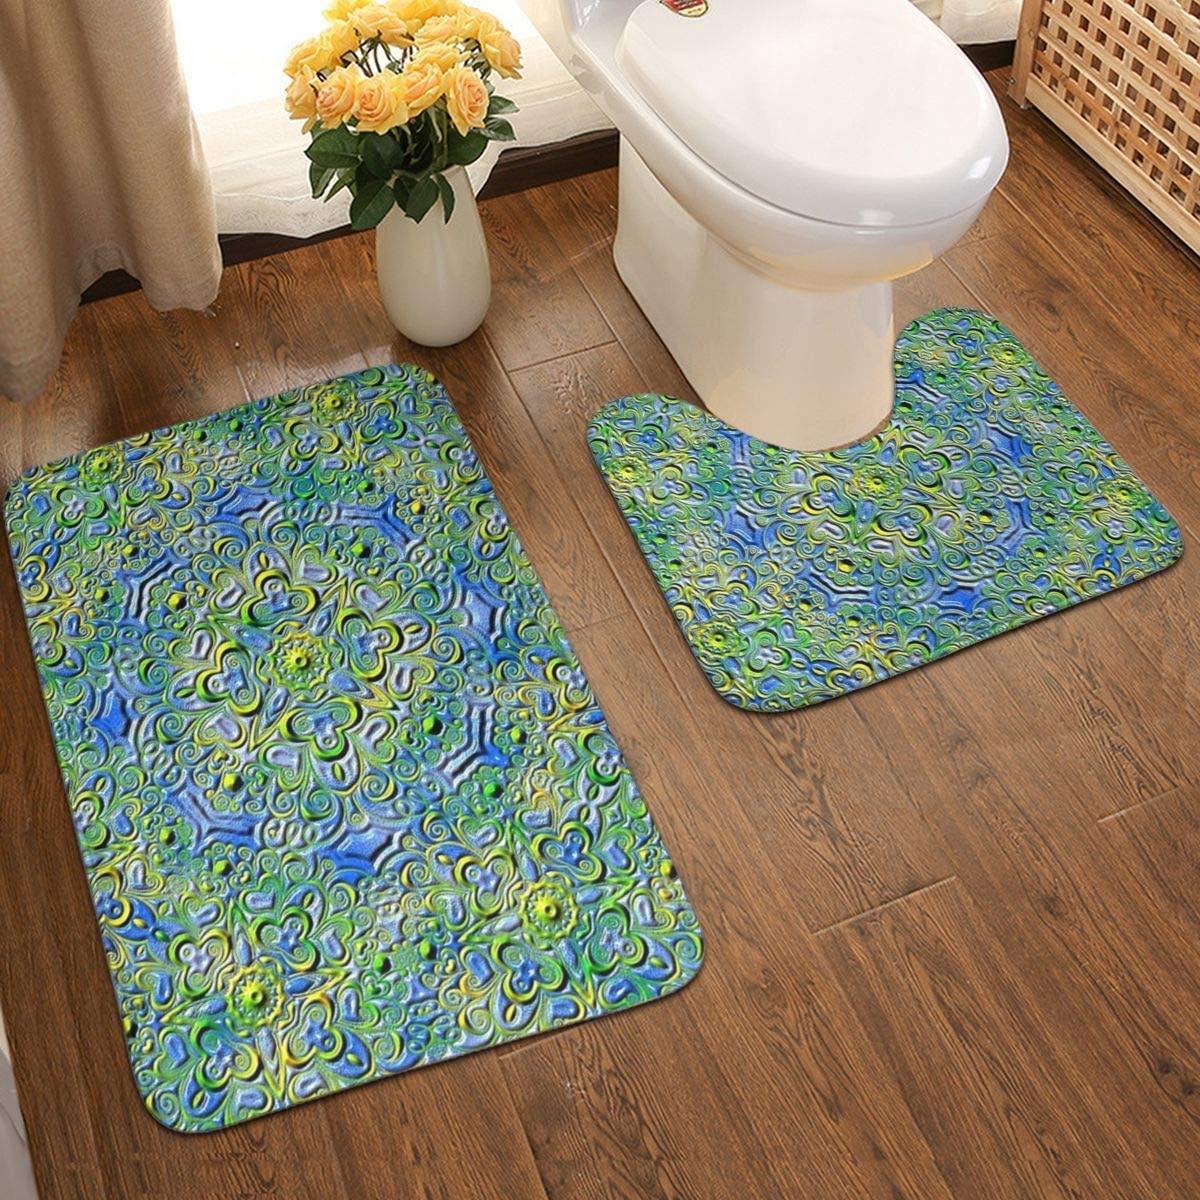 Farbenpracht Kaleidoscope Colorful Units Rainbow Green Bathroom Antiskid Pad 2 Pieces Bathroom Rugs Set Door Floors Soft Bath Mats Carpet for Tub Shower Personalized